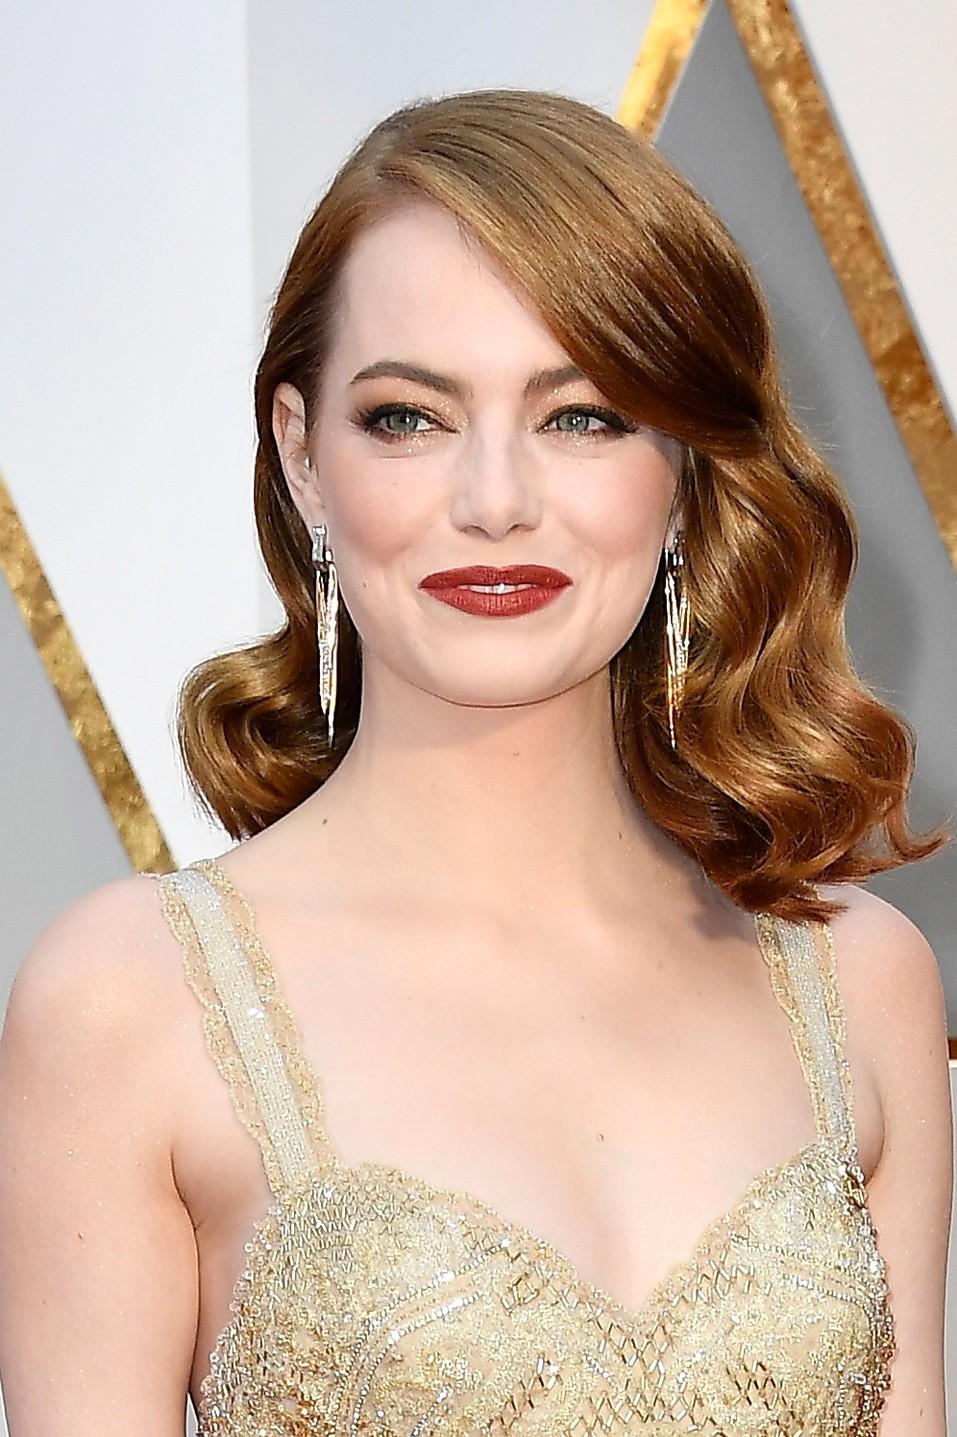 Actor Emma Stone